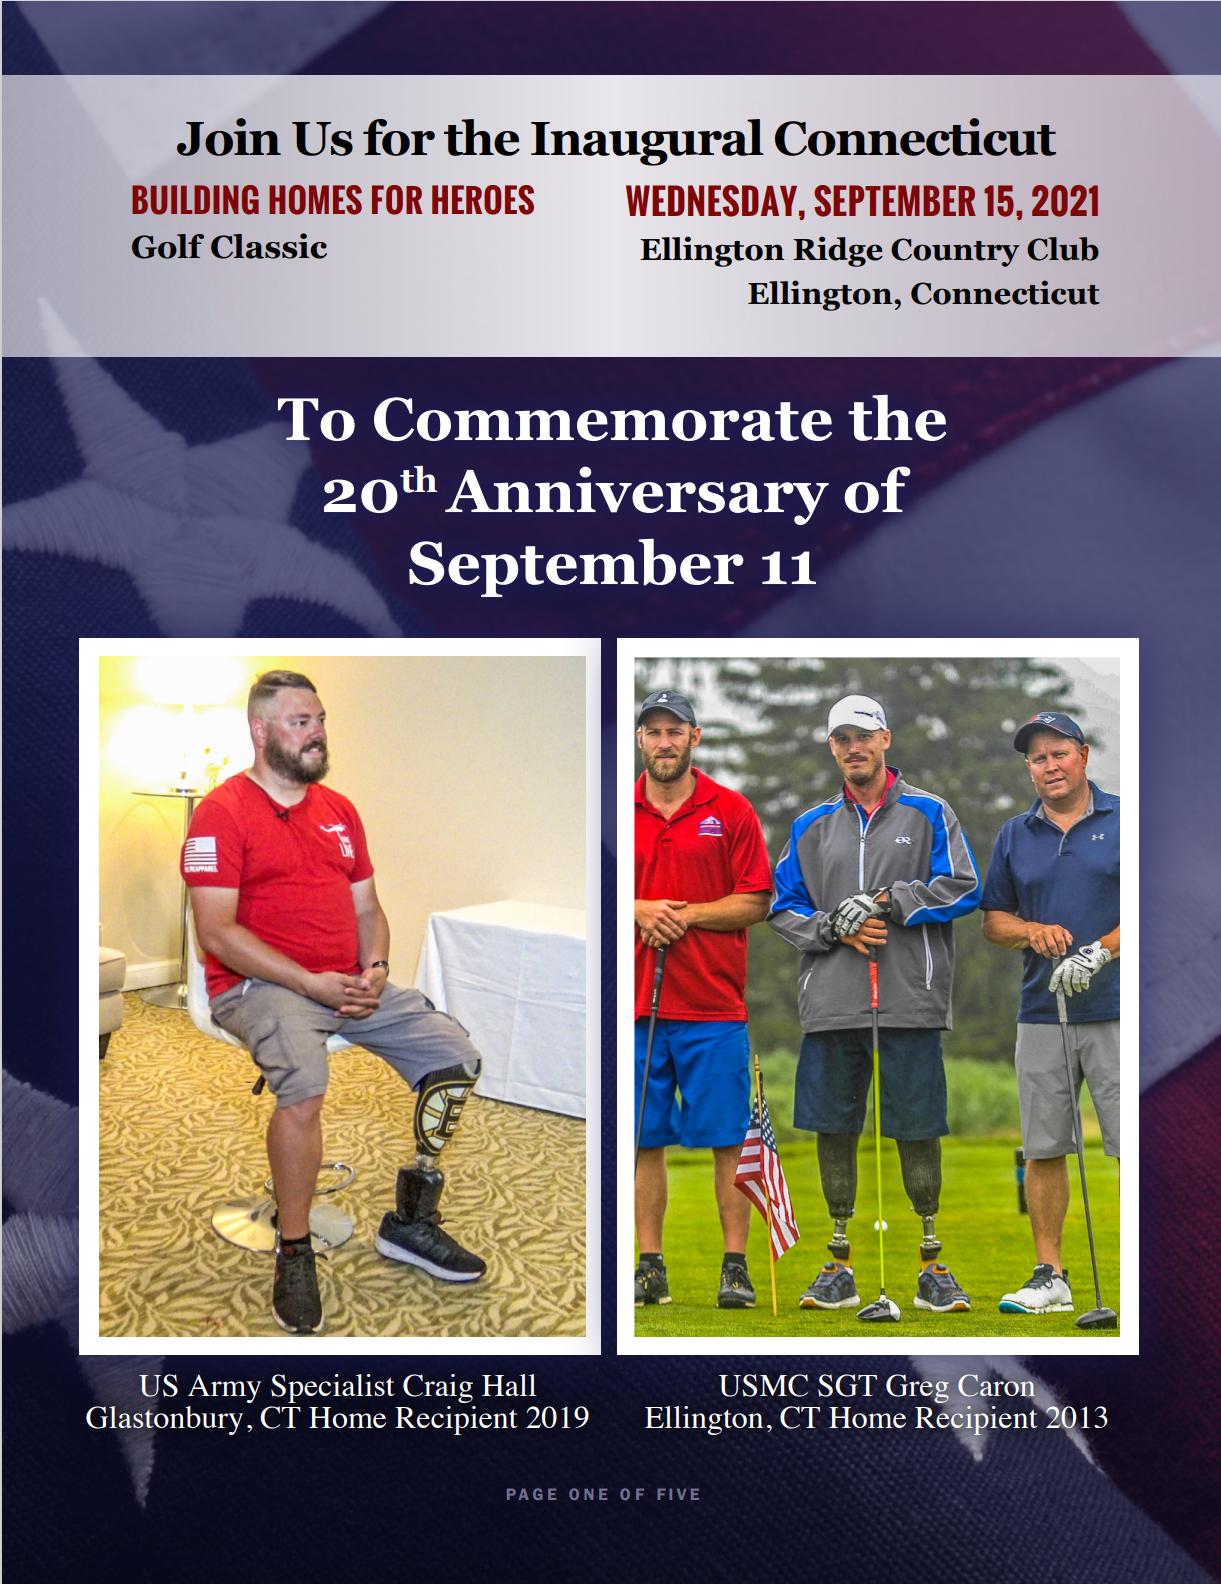 Inaugural Connecticut Golf Outing! @ Ellington Ridge Country Club